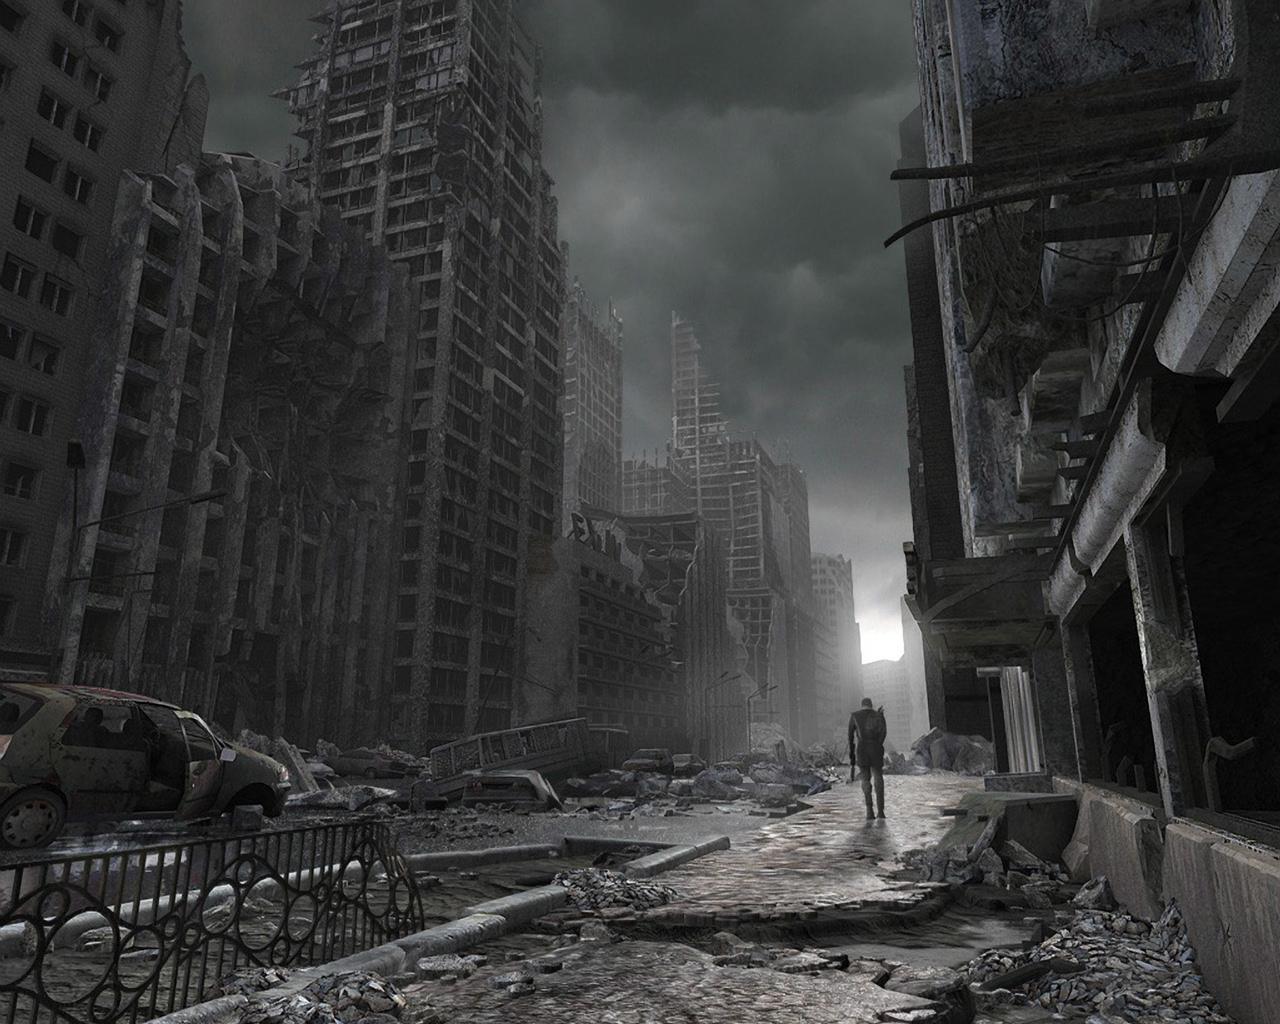 https://vermontprideblog.files.wordpress.com/2021/05/ca6cc-apocalyptic-city-background.jpg